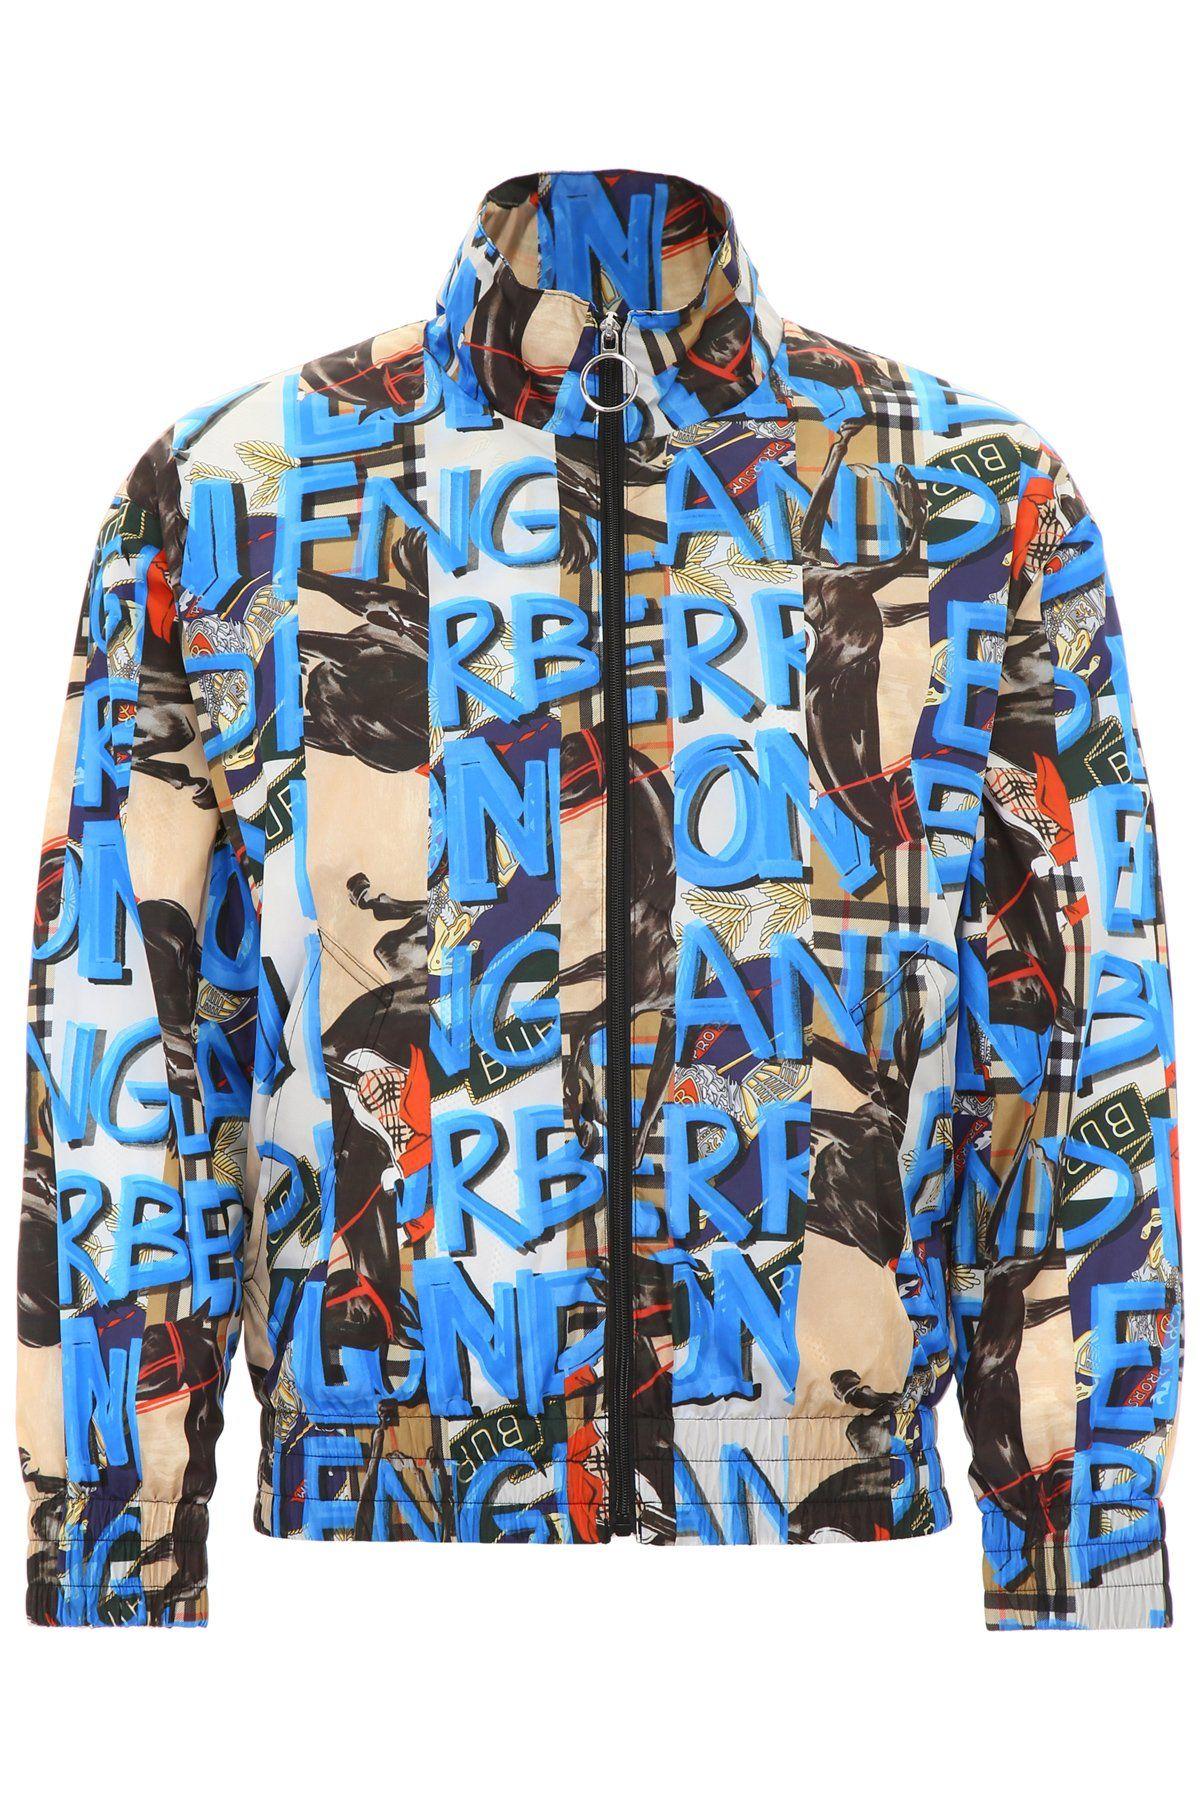 Burberry Burberry Graffiti Print Zipped Jacket Burberry Cloth